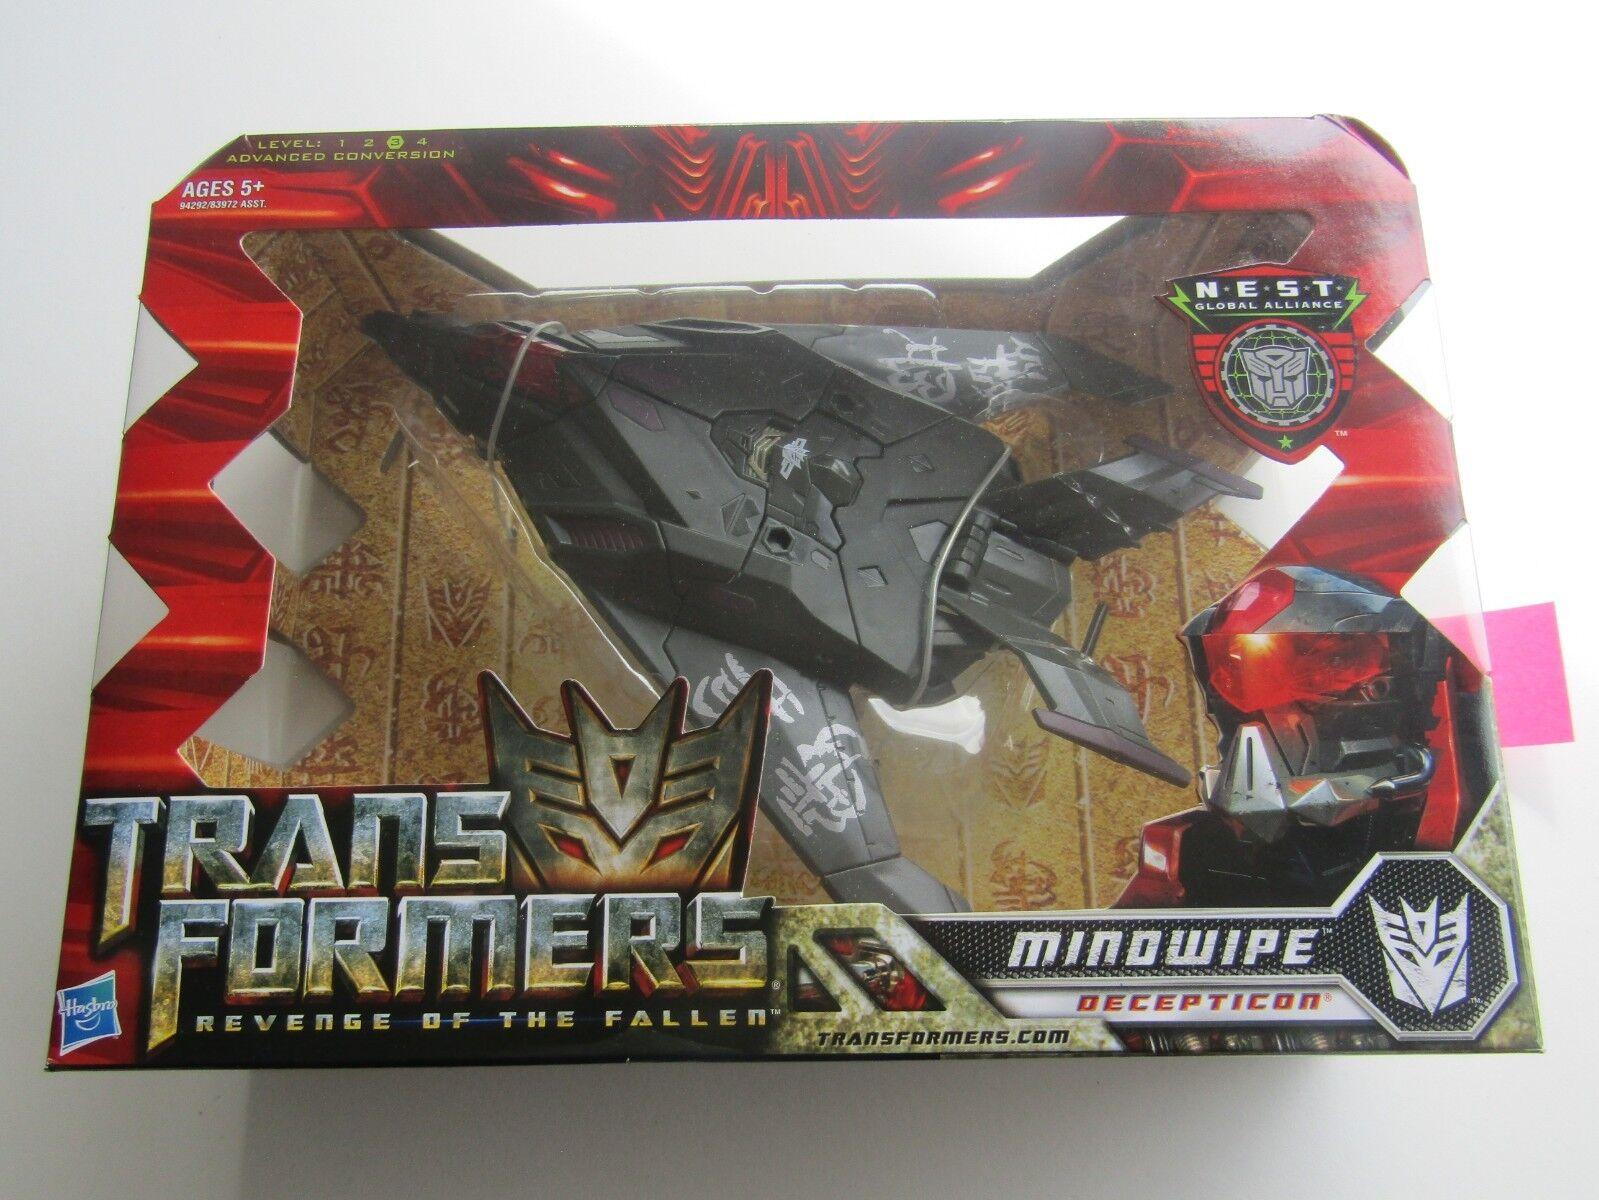 Hasbro Transformers redF Voyager Mindwipe